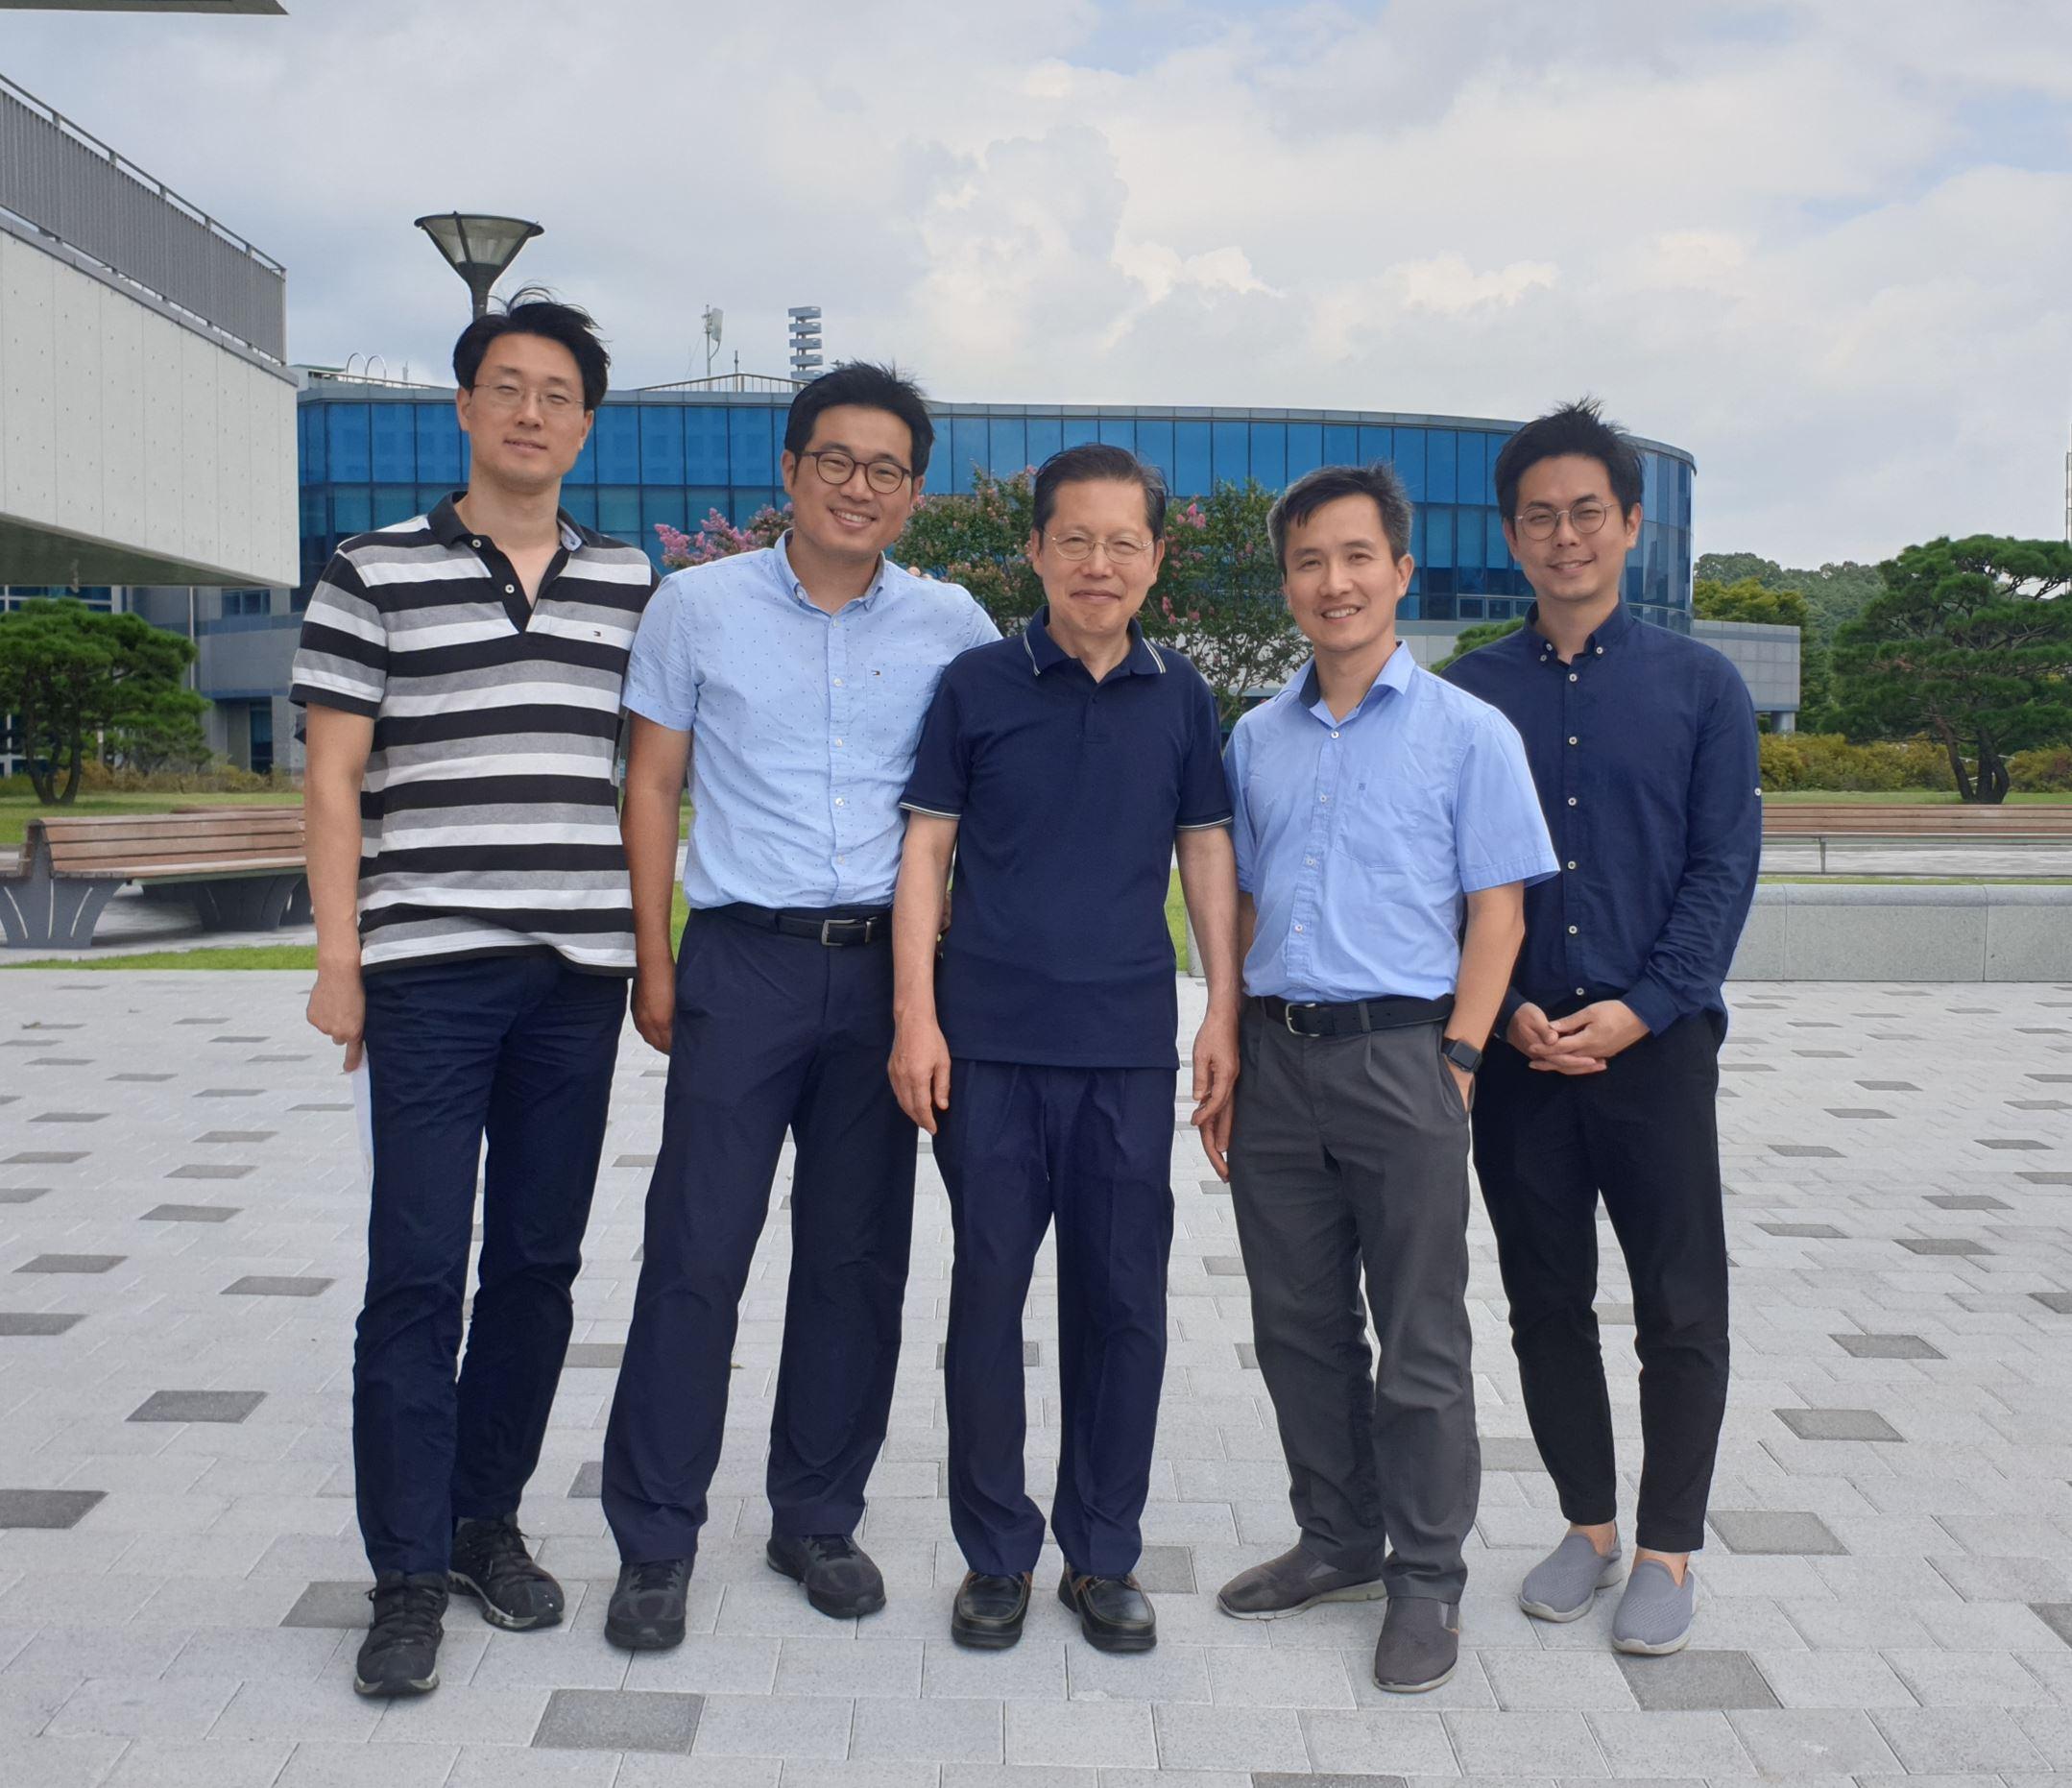 Mini Alumni (a.k.a Prof. Cho's Kids)